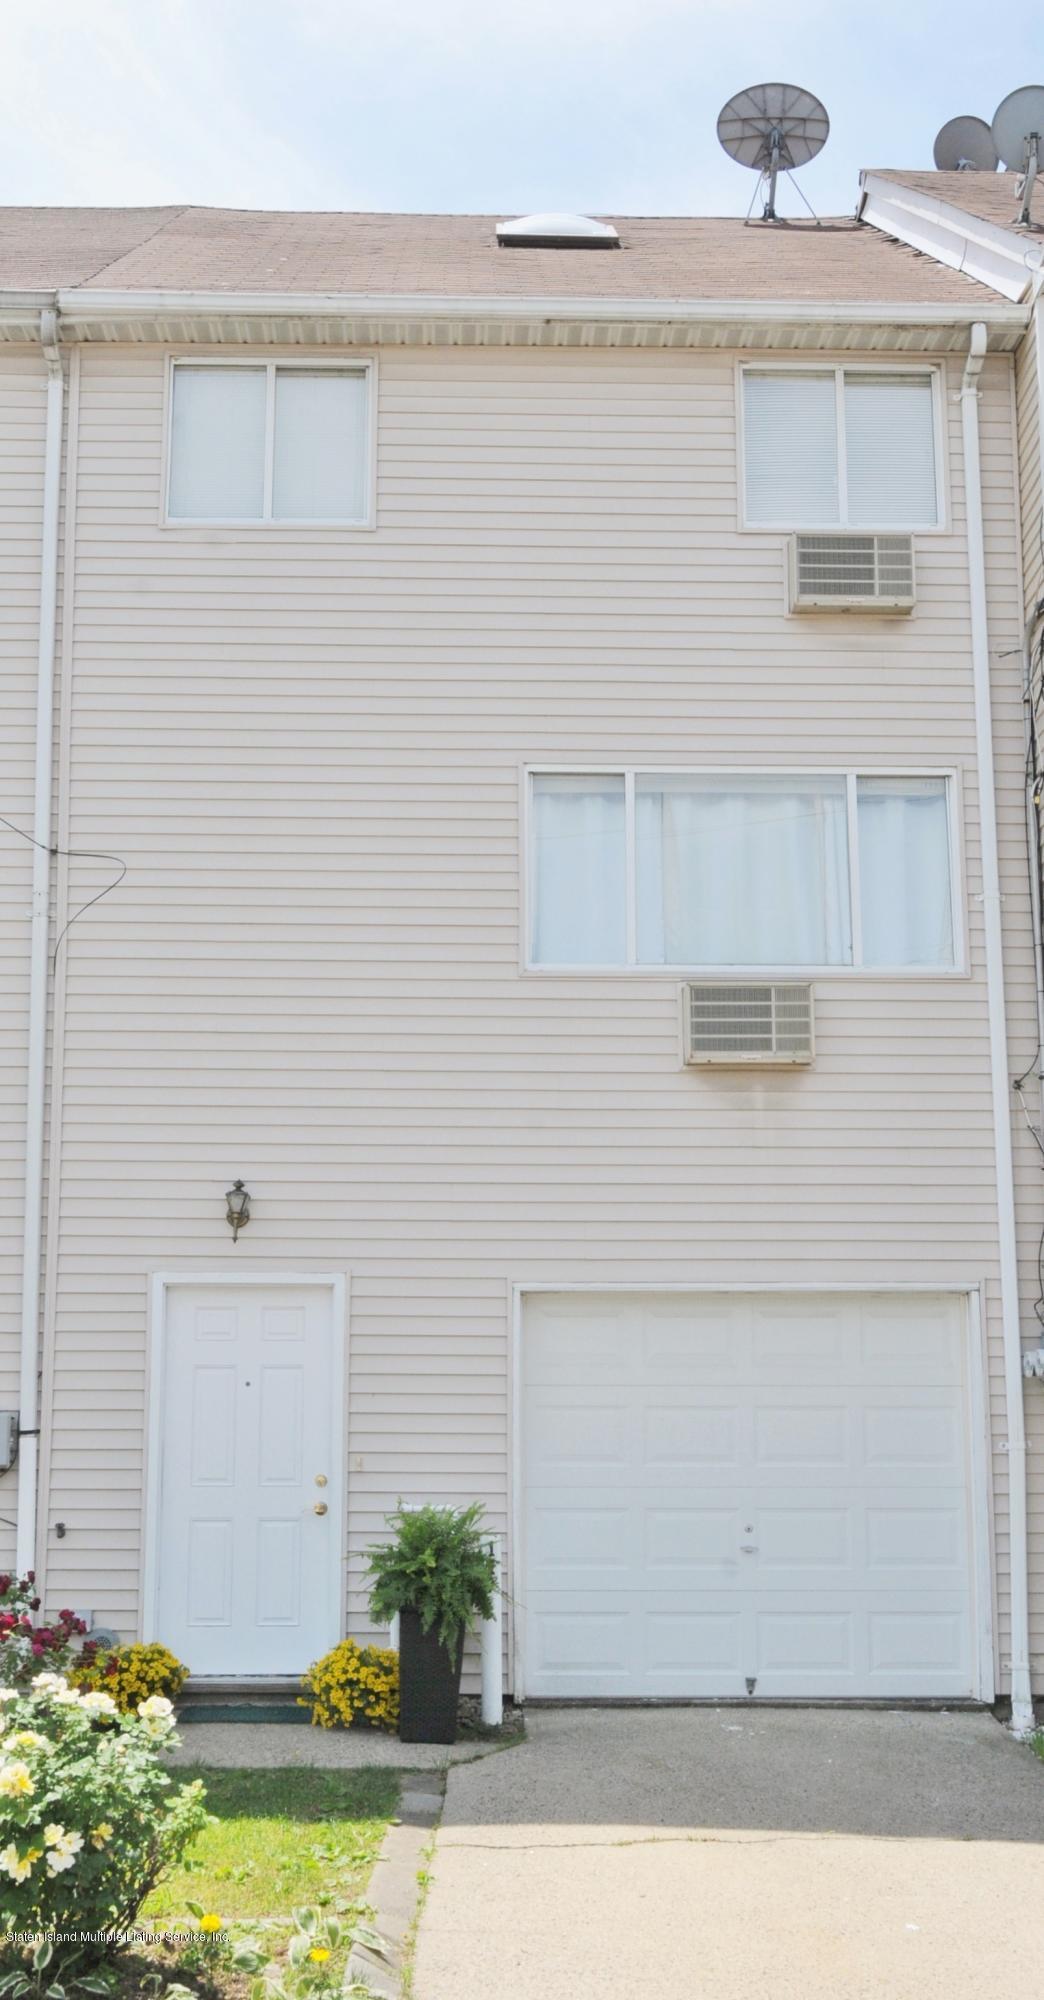 Single Family - Attached 117 Clark Lane  Staten Island, NY 10304, MLS-1129710-5